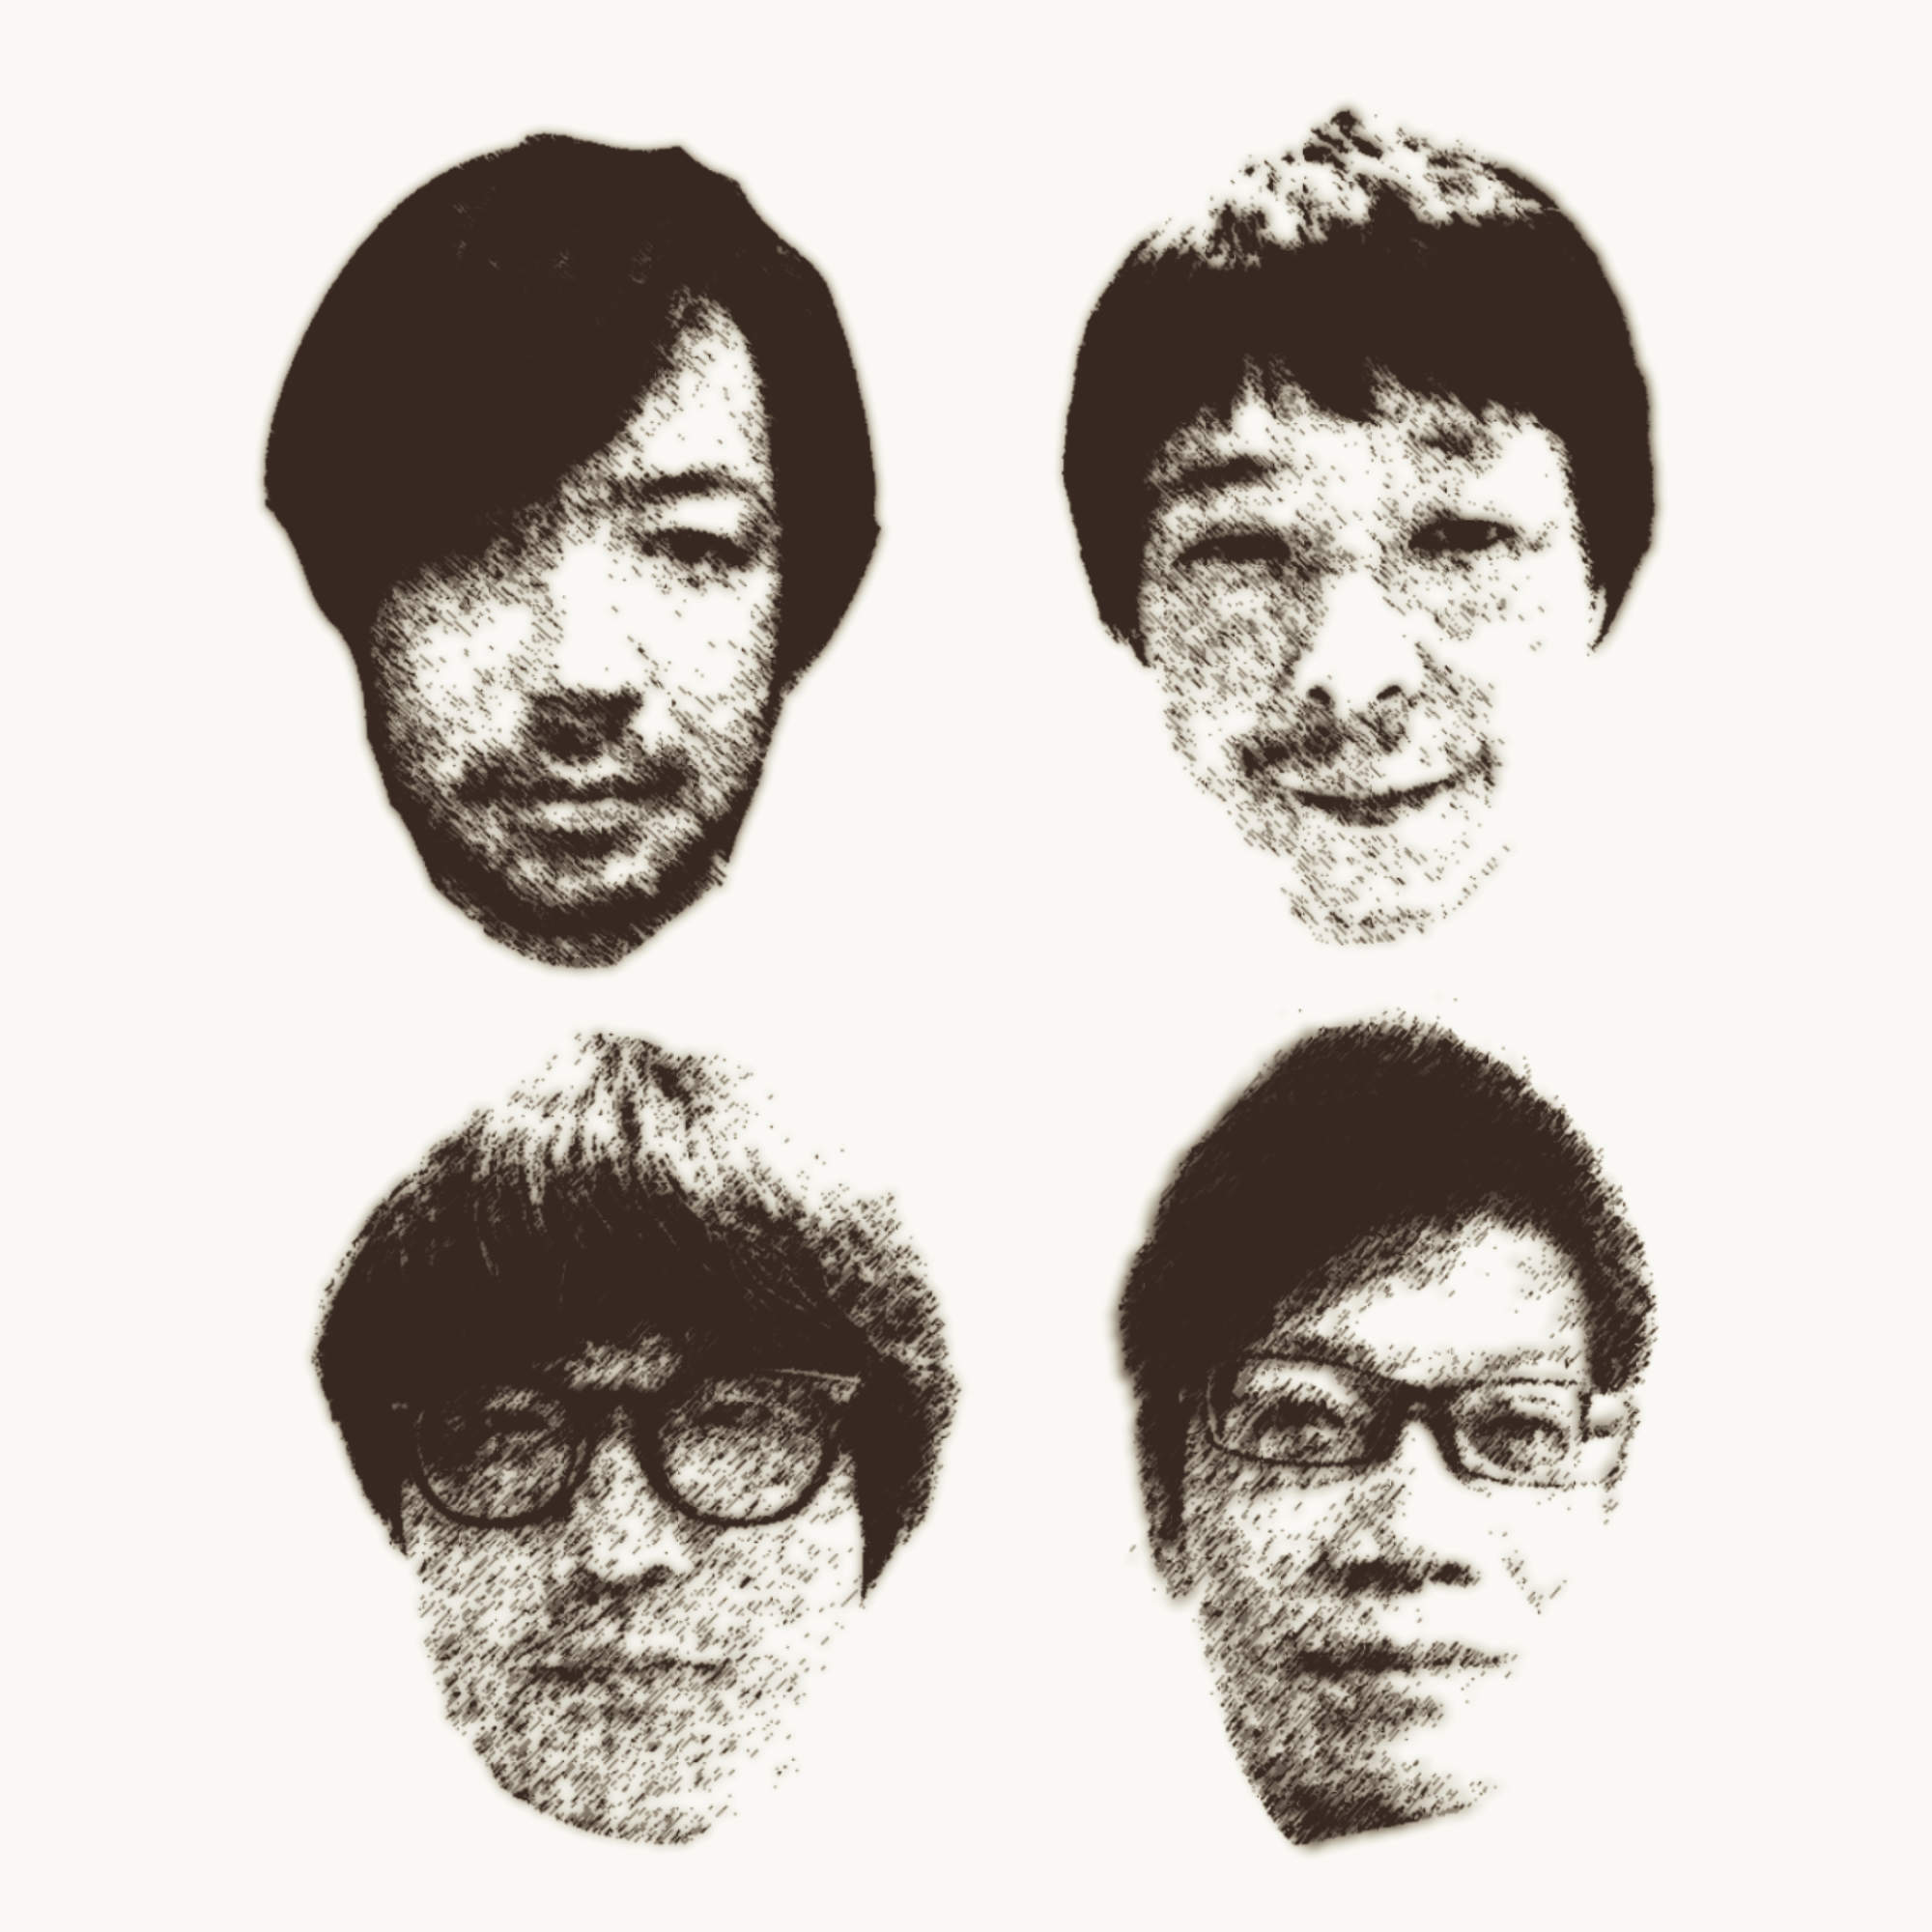 http://rose-records.jp/files/20210820232934.jpg